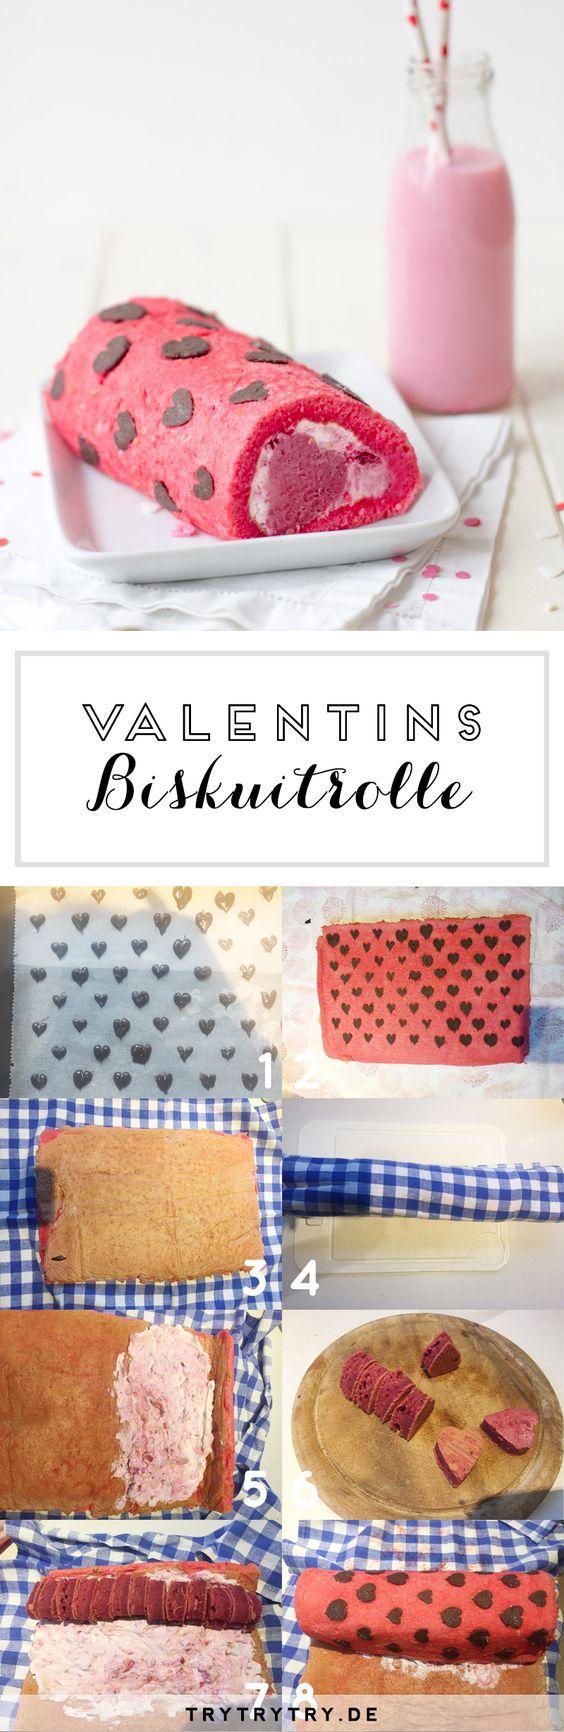 Valentinstags Biskuitrolle